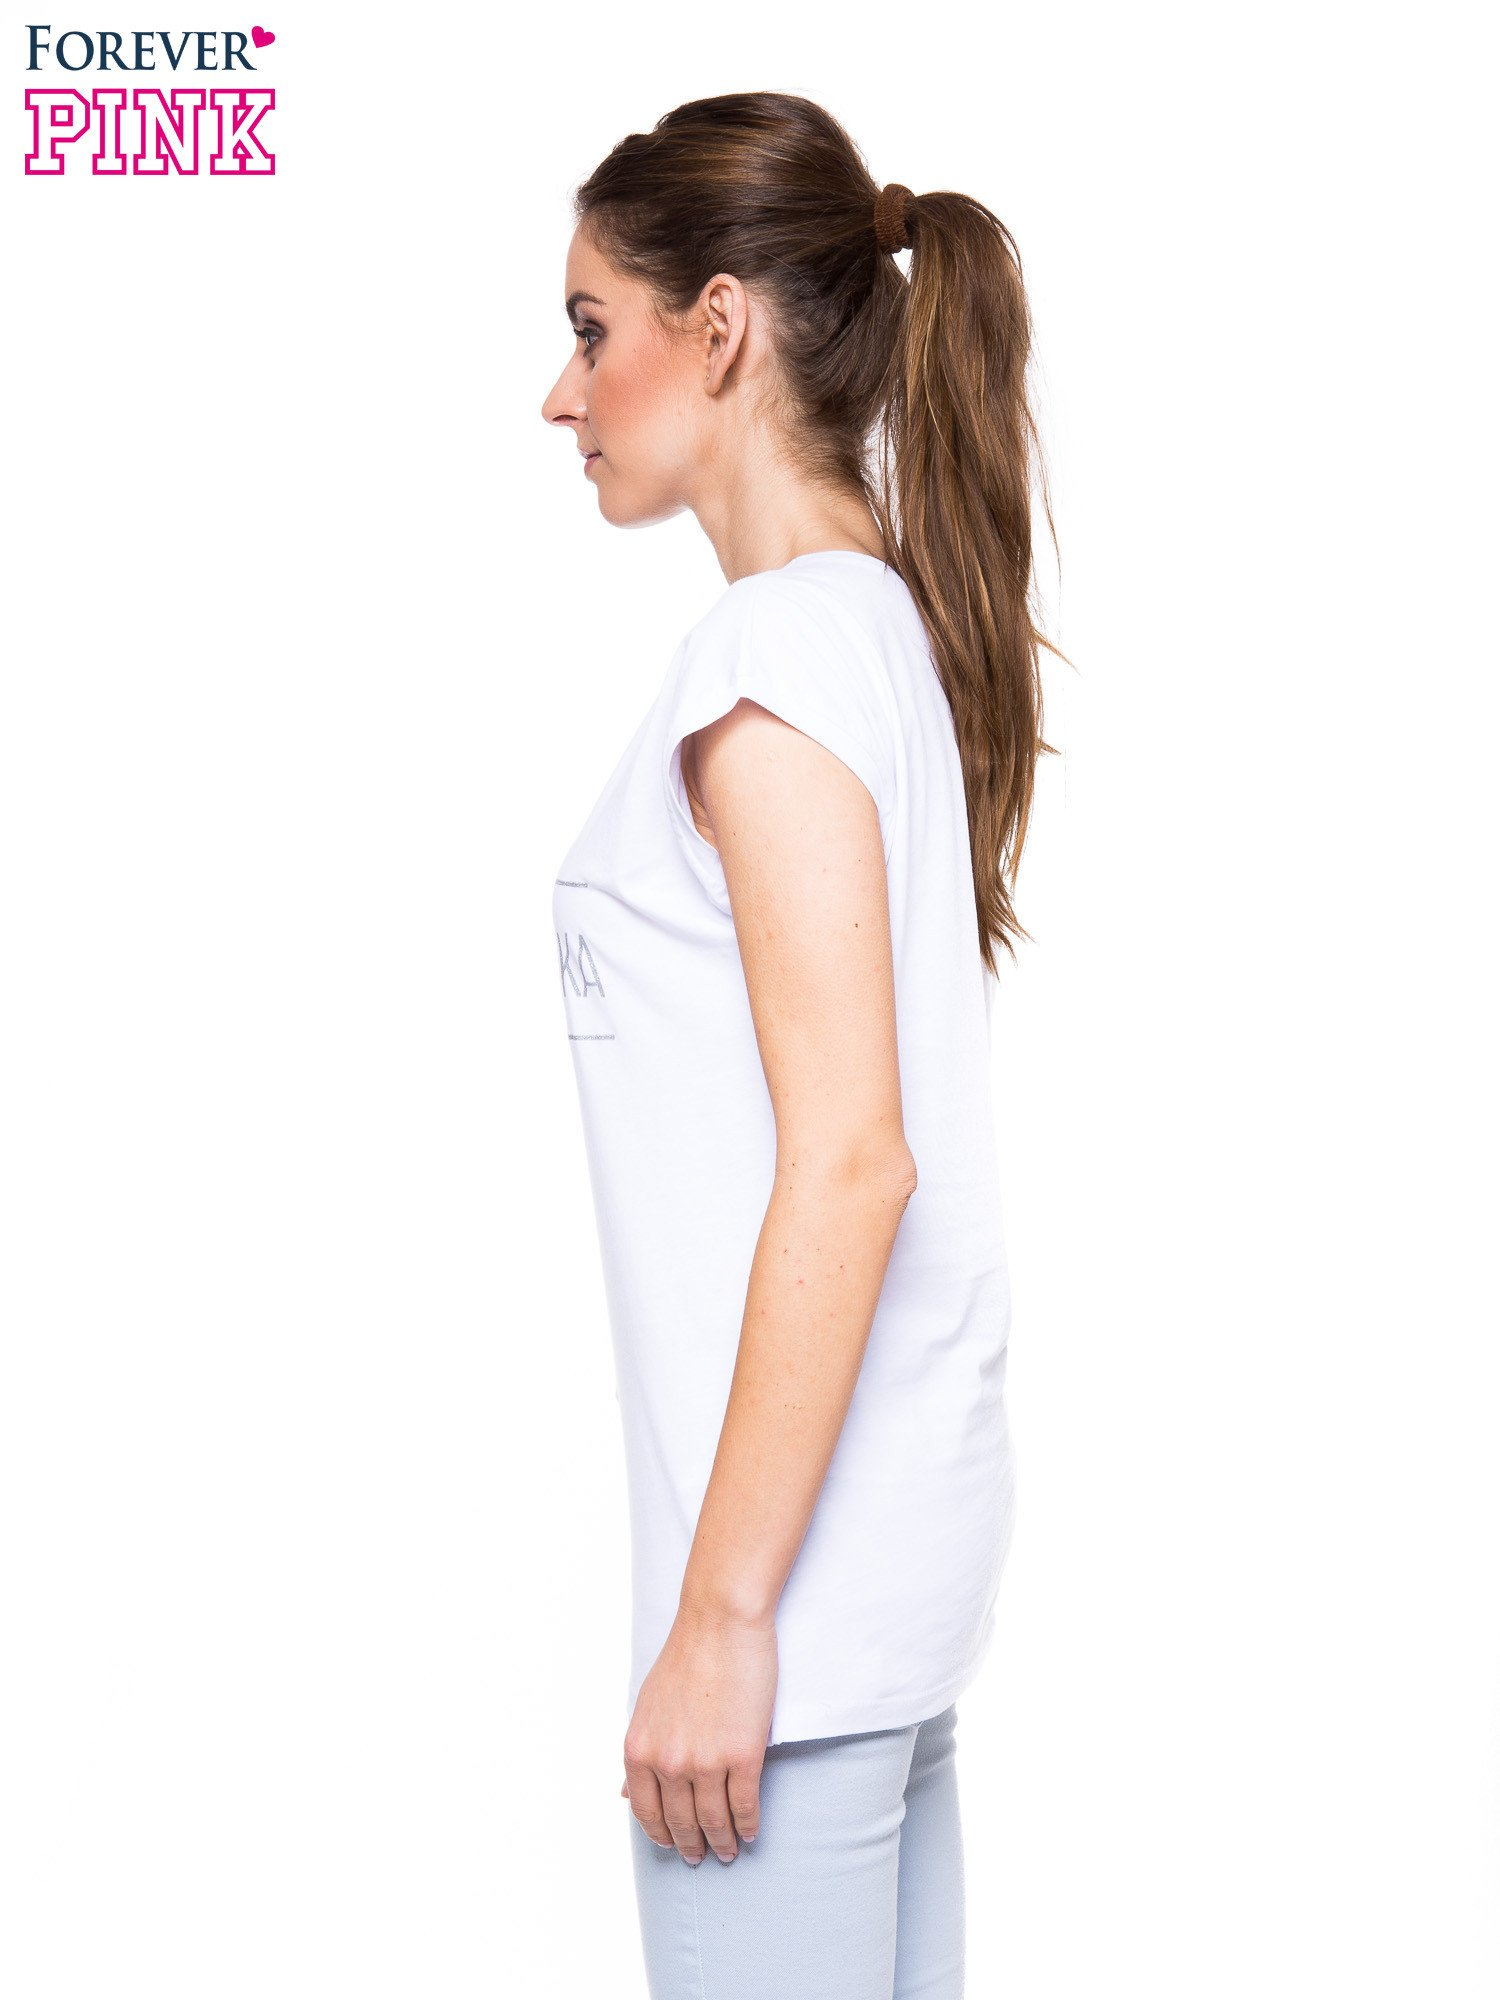 68f7f6583 Biały t-shirt z nadrukiem PANI KIEROWNICZKA - T-shirt z nadrukiem ...